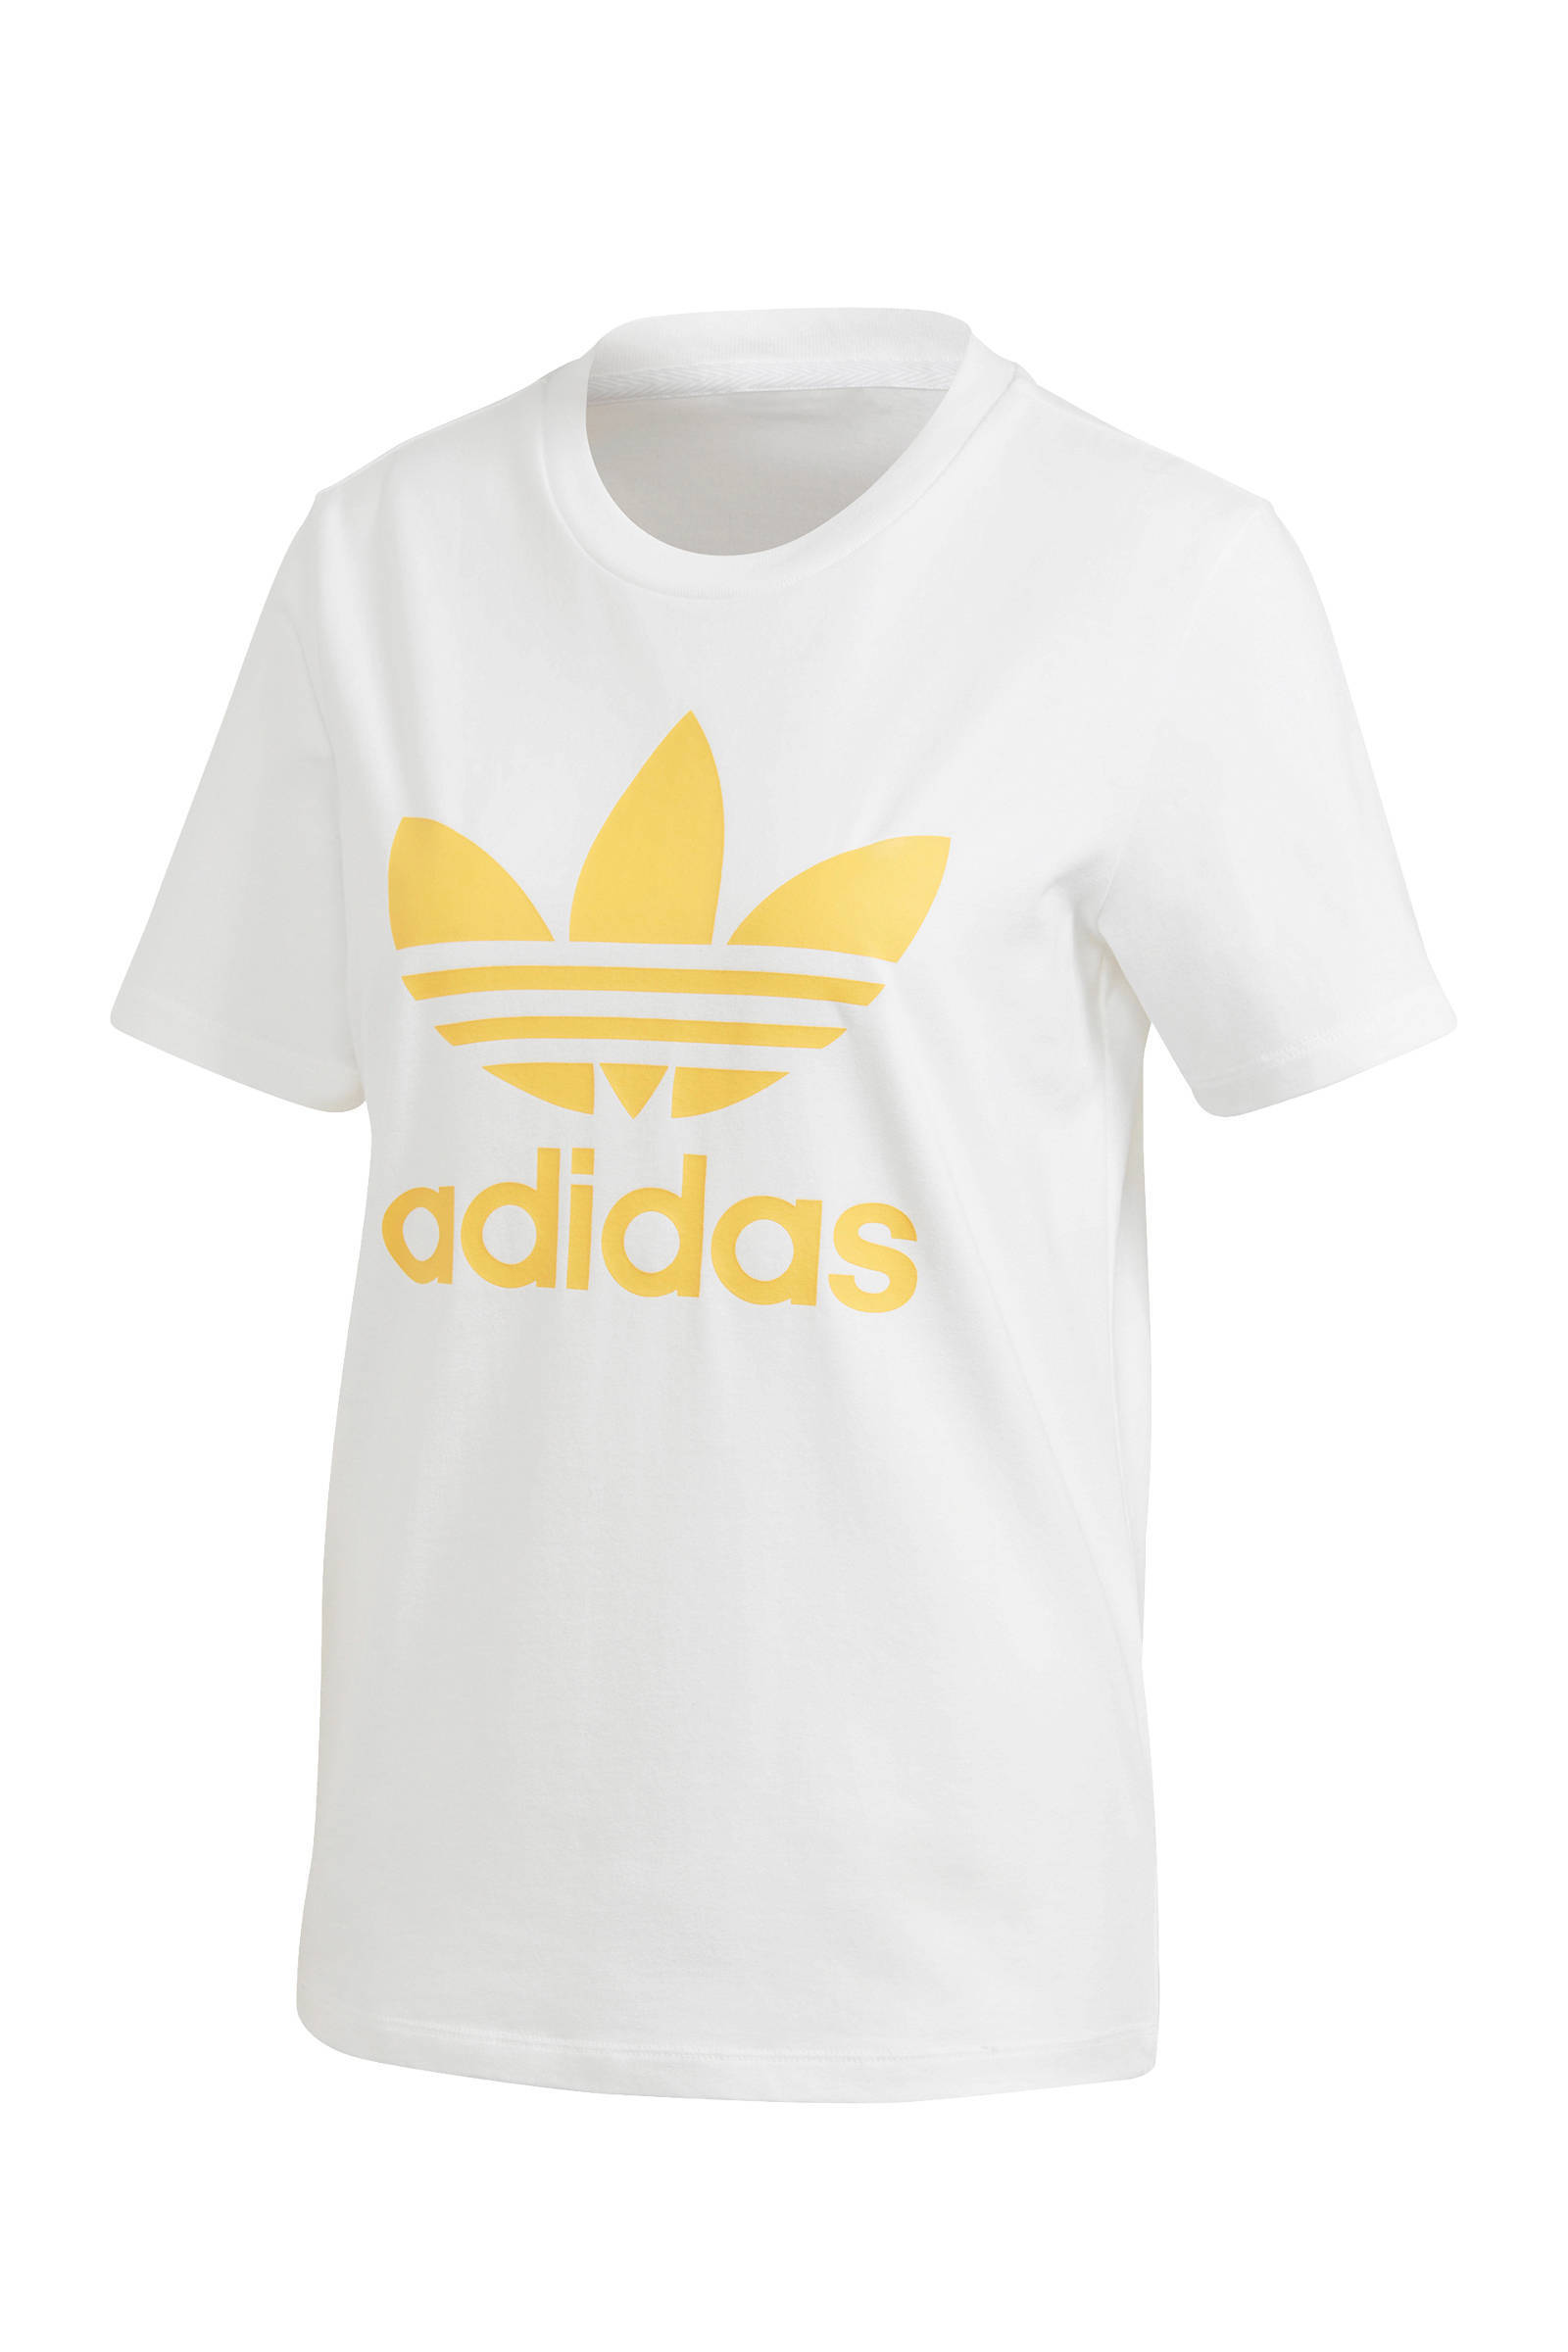 T-shirt wit/geel